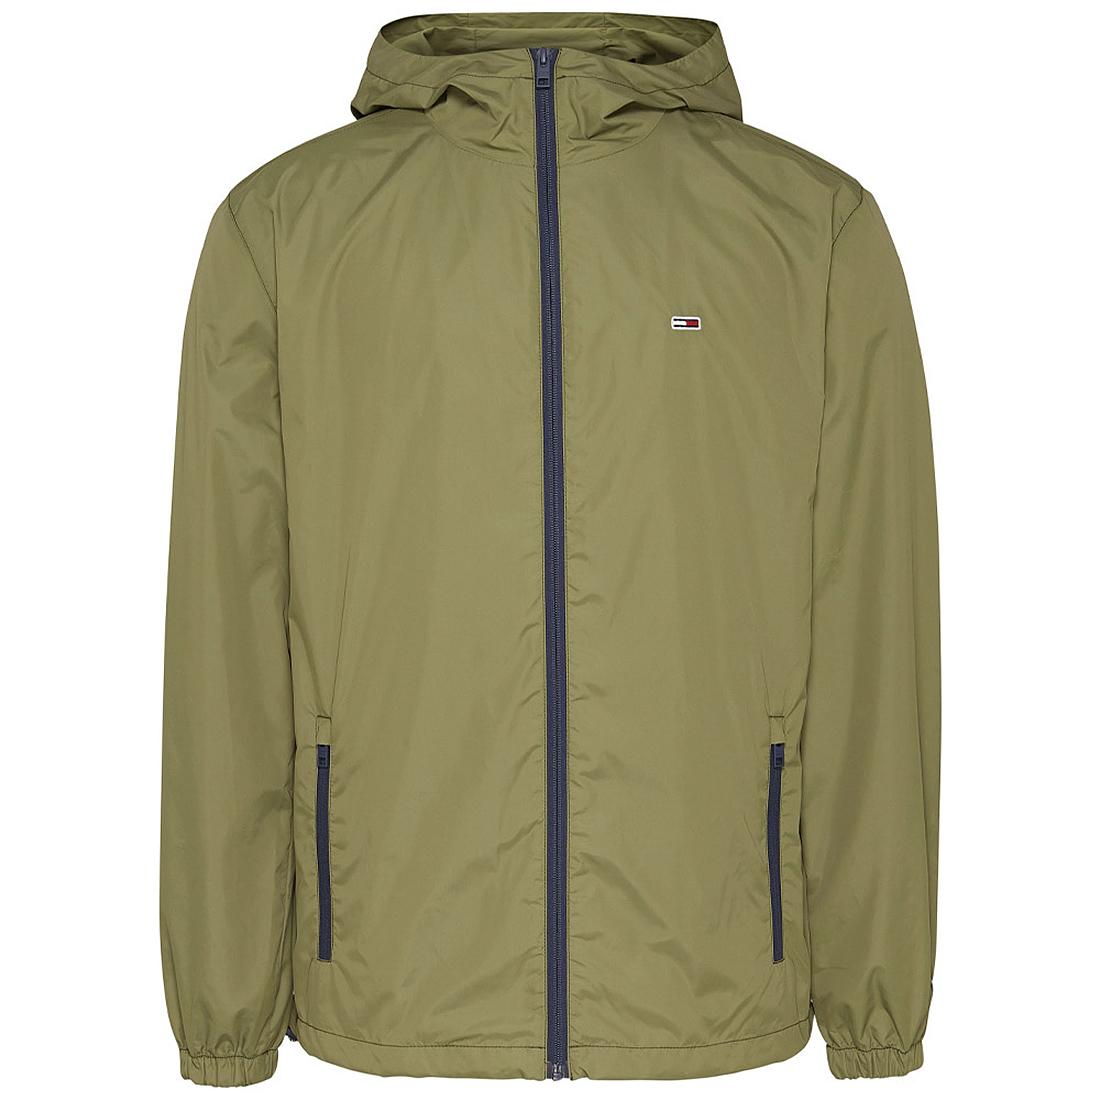 Packable Windbre Jacket in Green